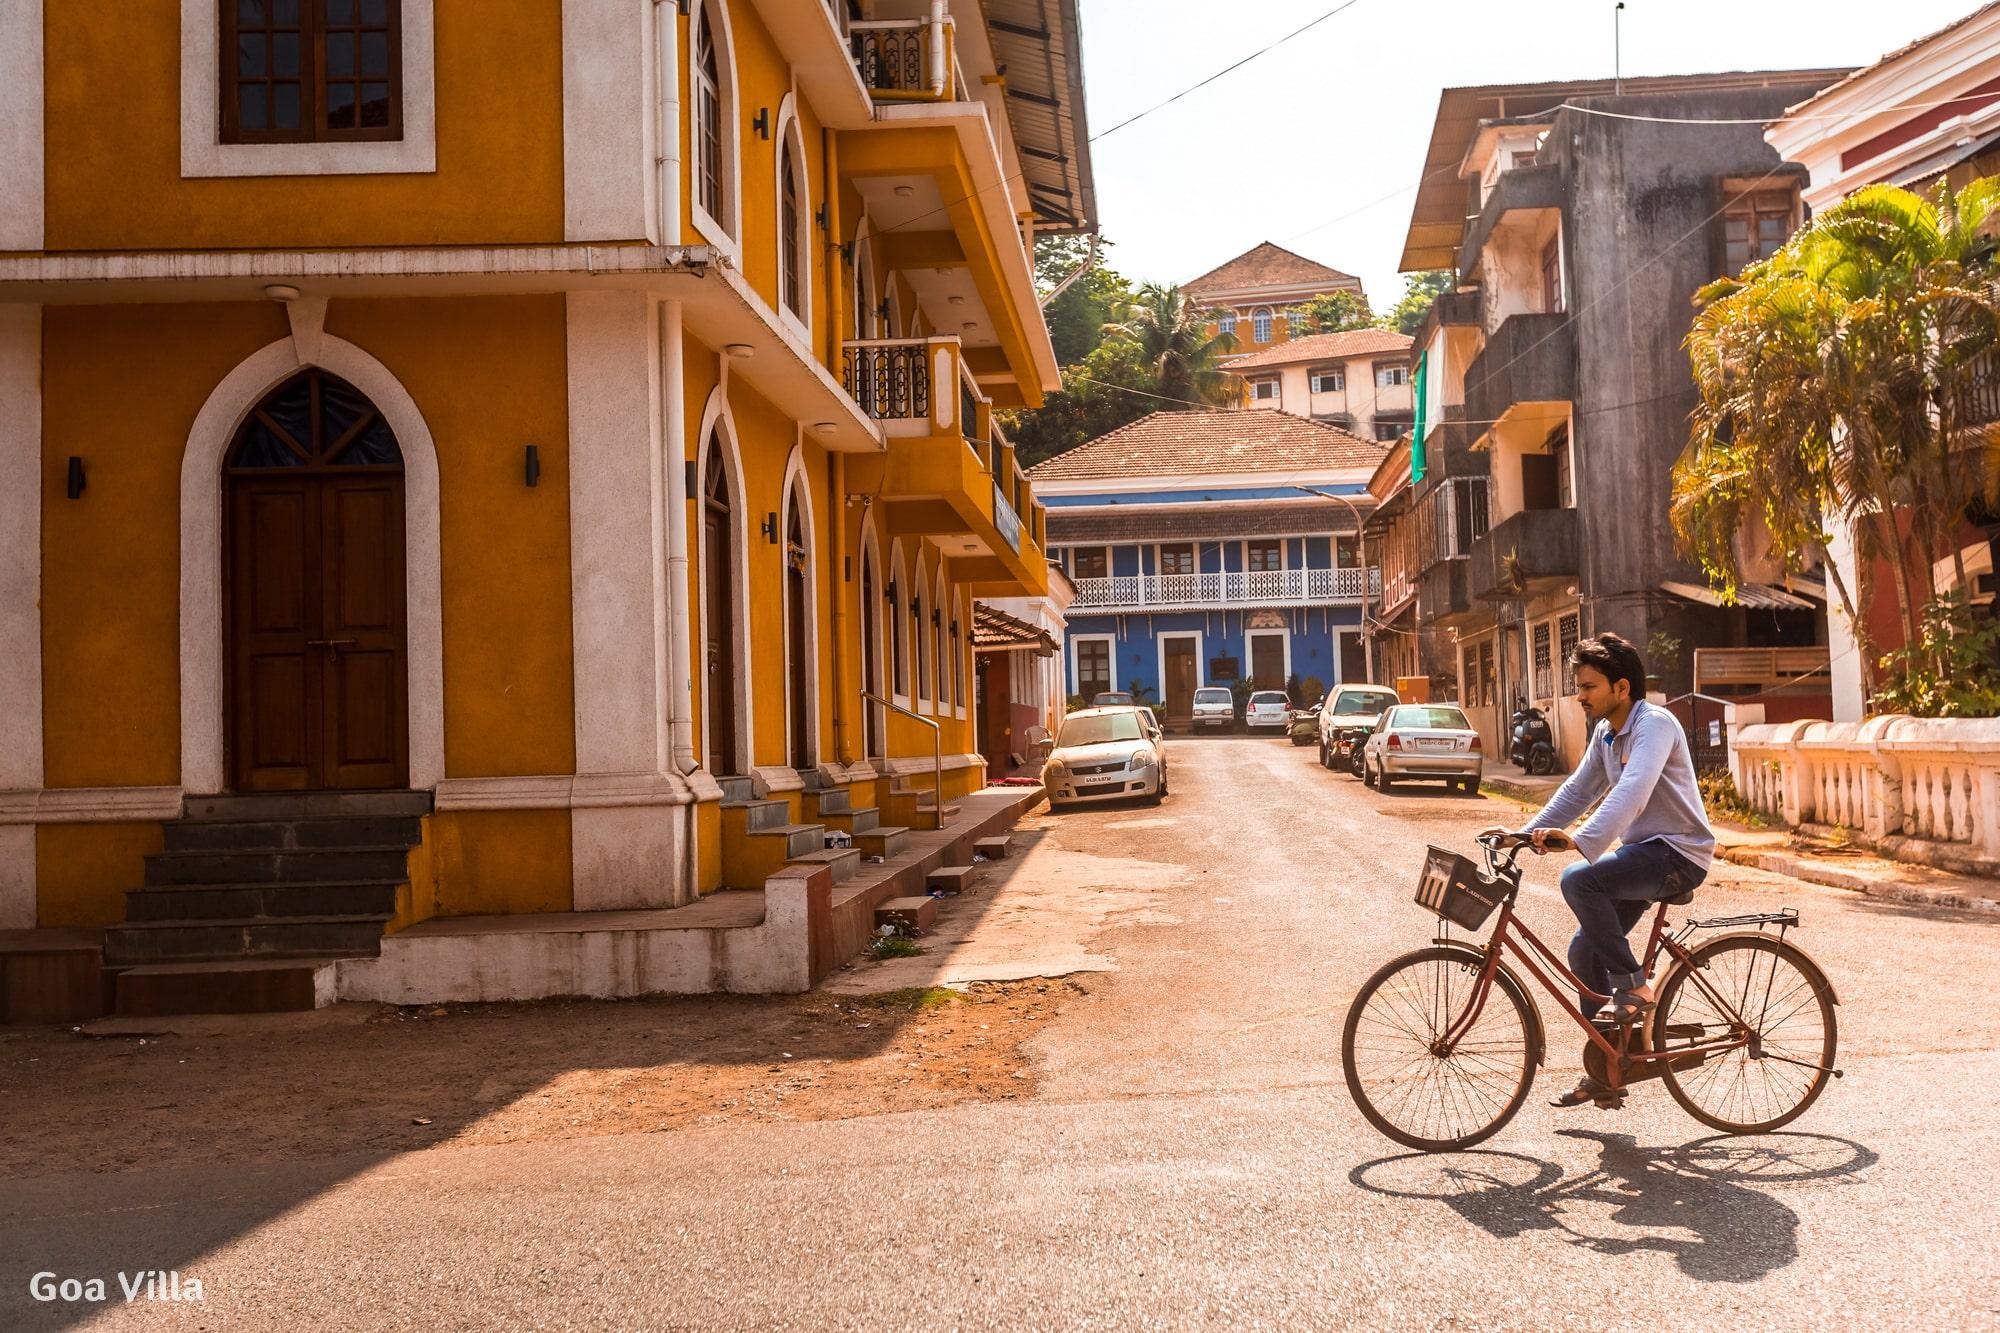 Panaji – the capital of Goa, also known as Panjim